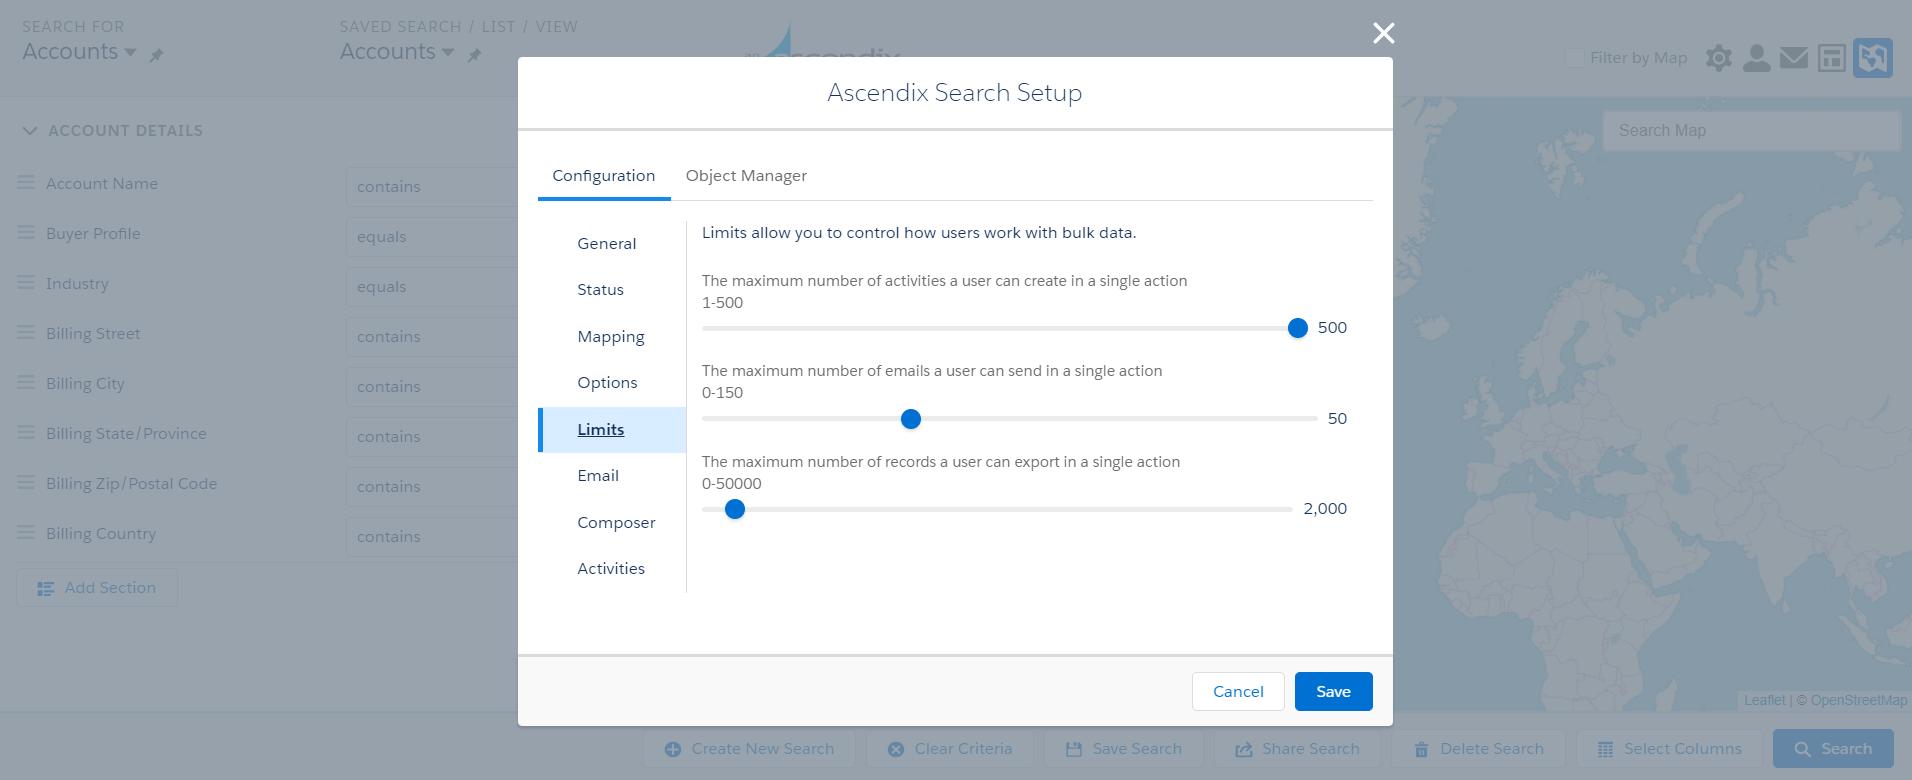 Salesforce data export limits in Ascendix Search